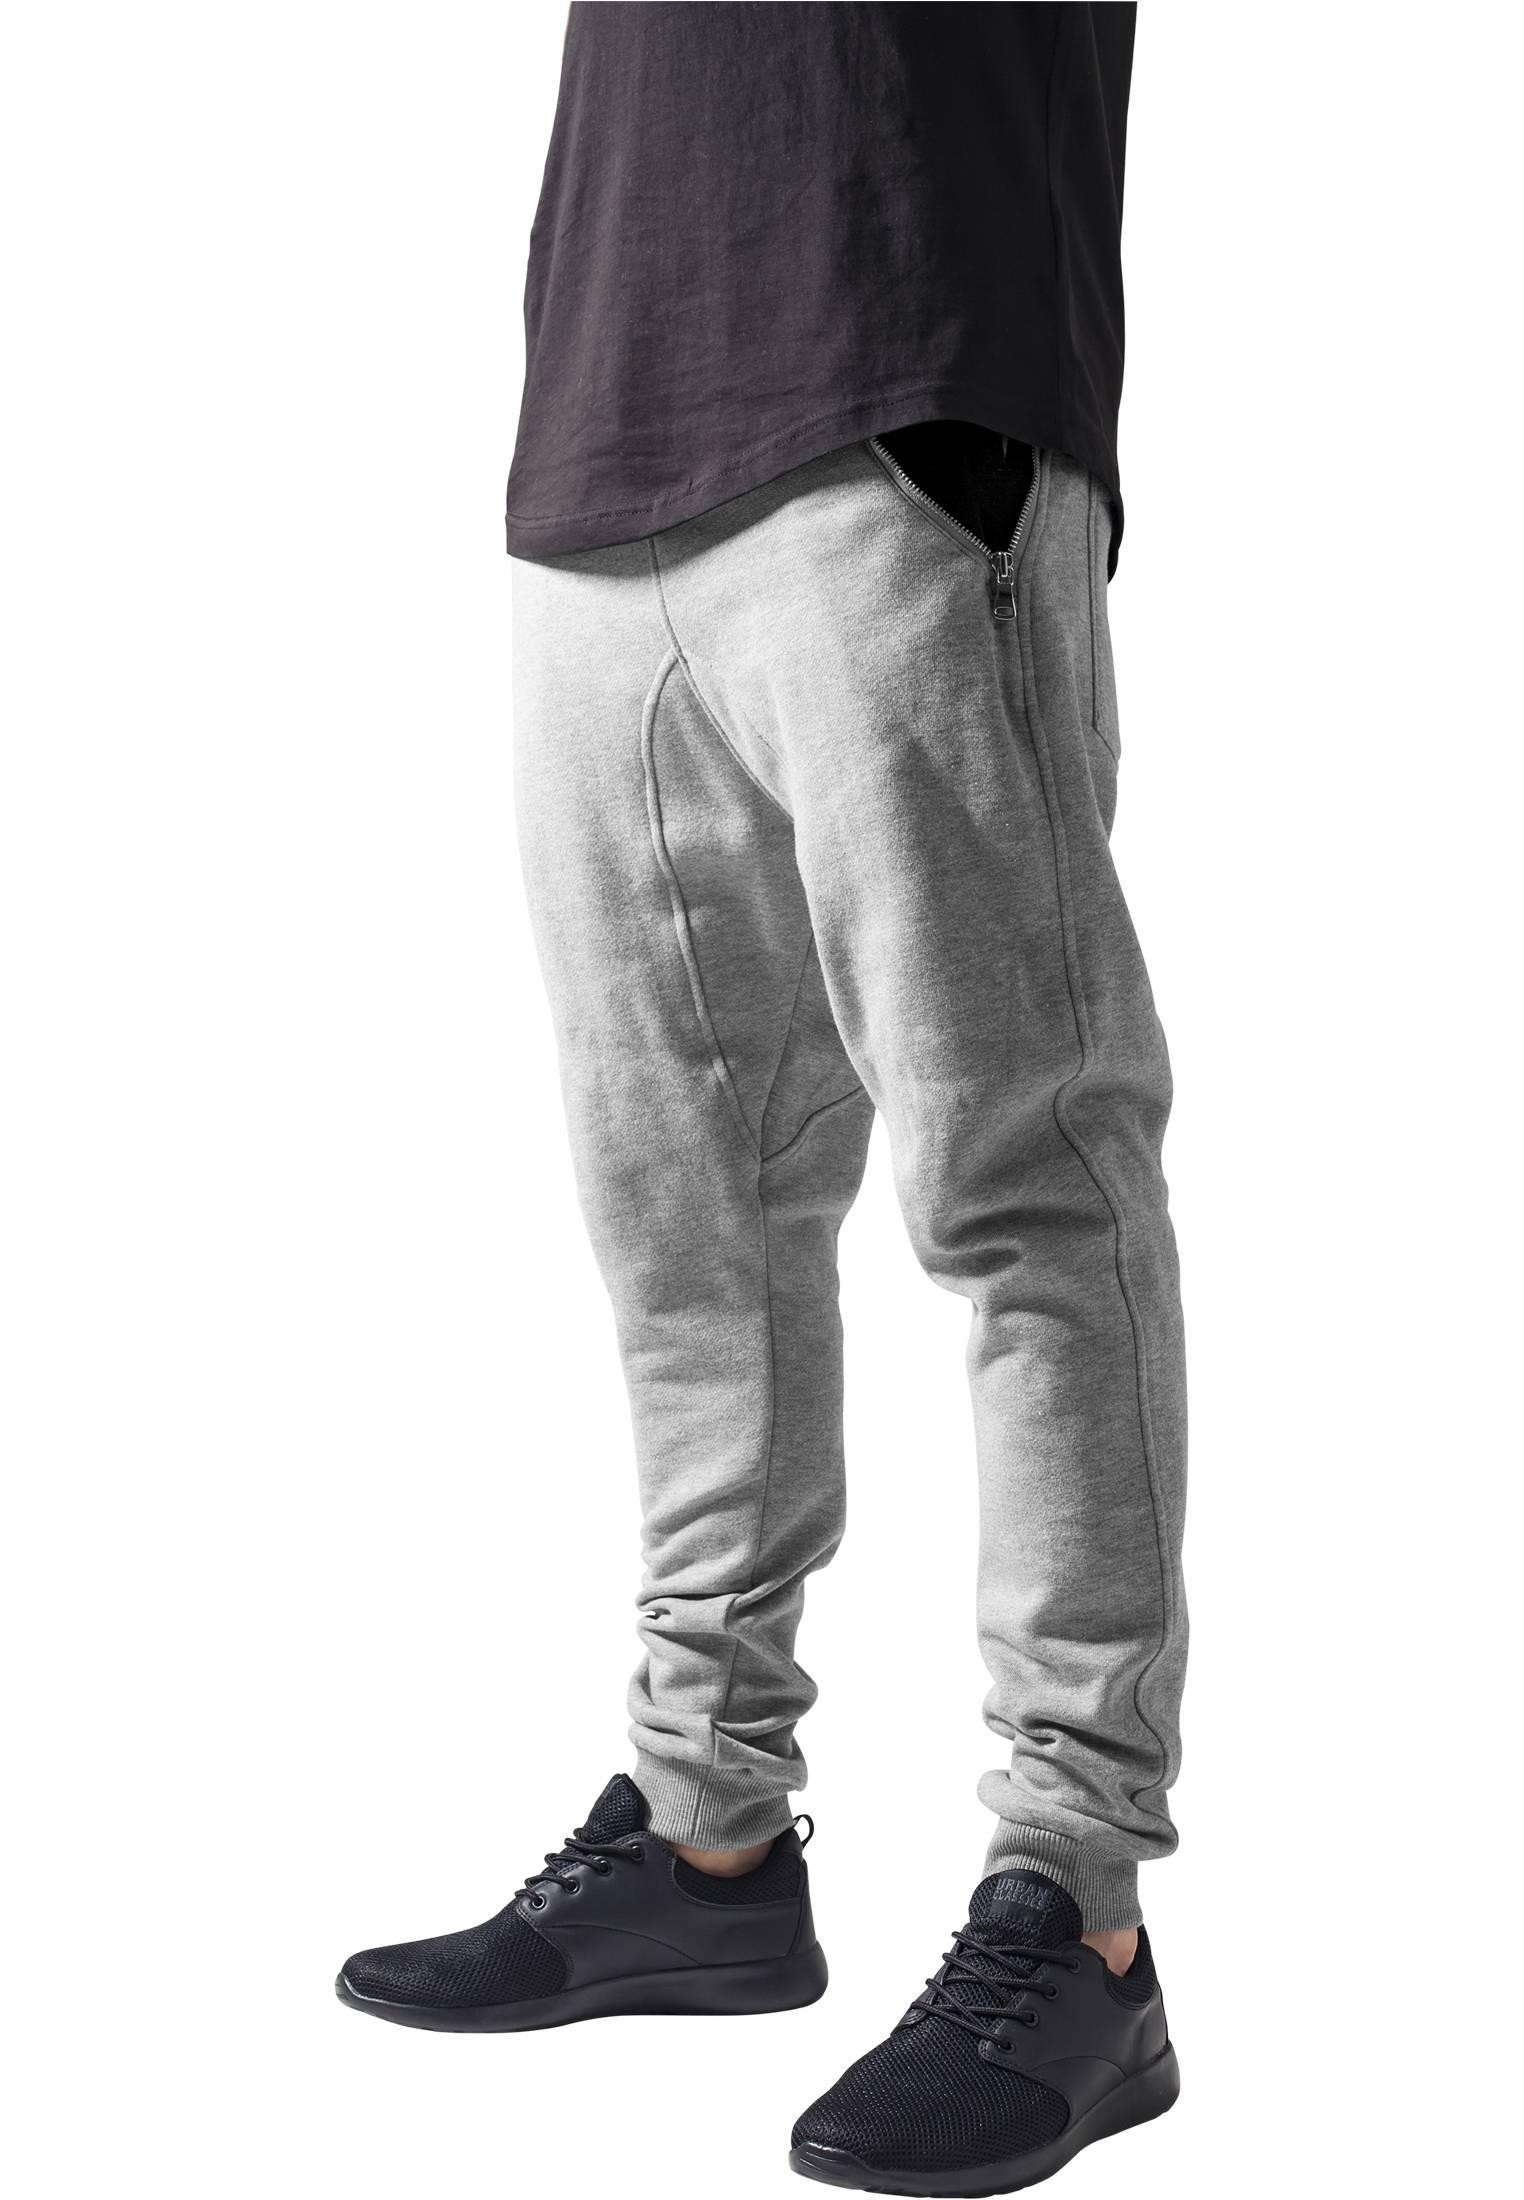 Urban Classics Side Zip Contrast Pocket Sweatpant gry/blk - S